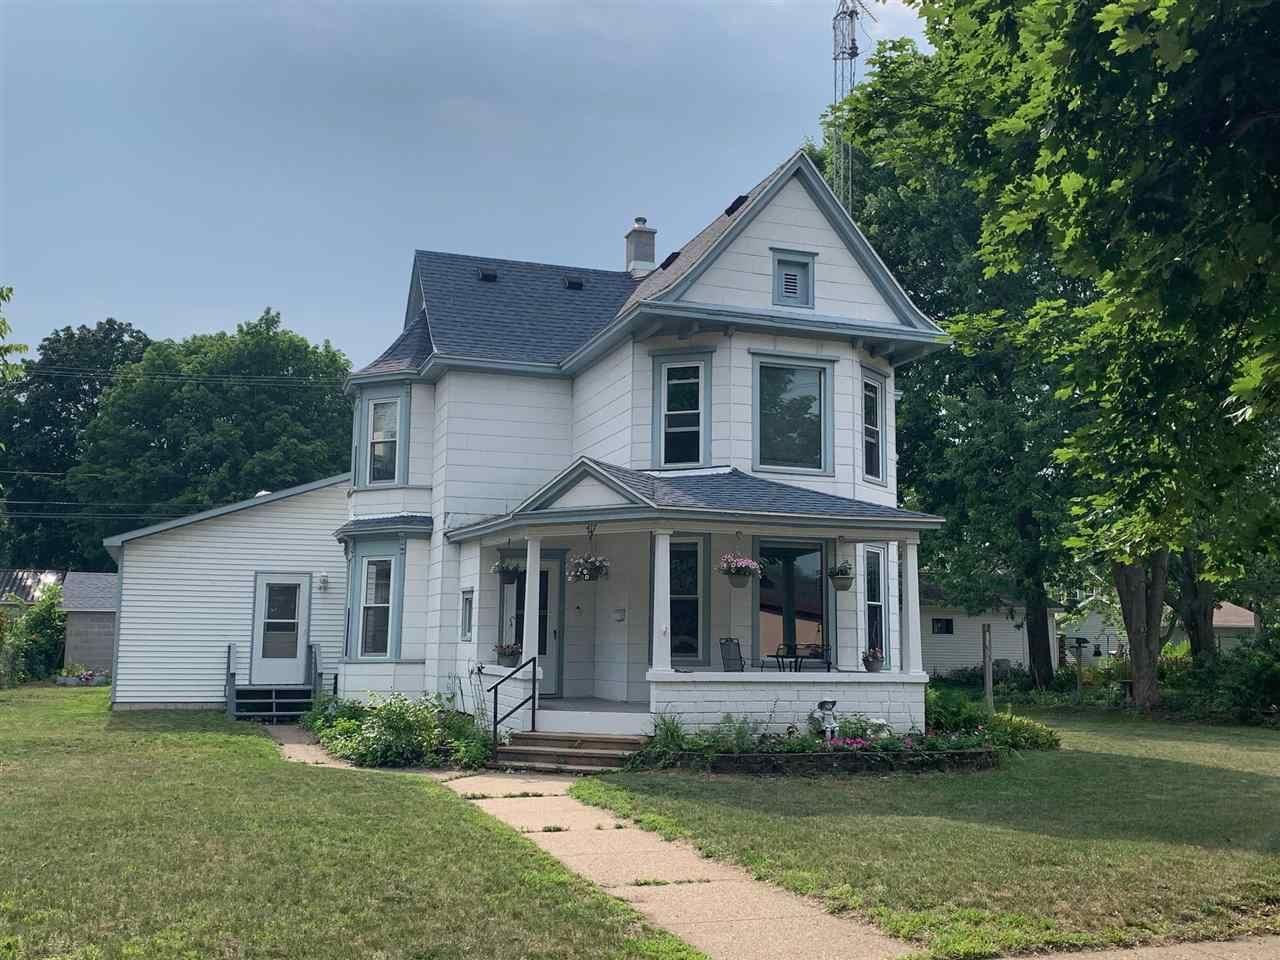 417 S Wacouta Ave, Prairie du Chien, WI 53821-9999 - #: 1915351